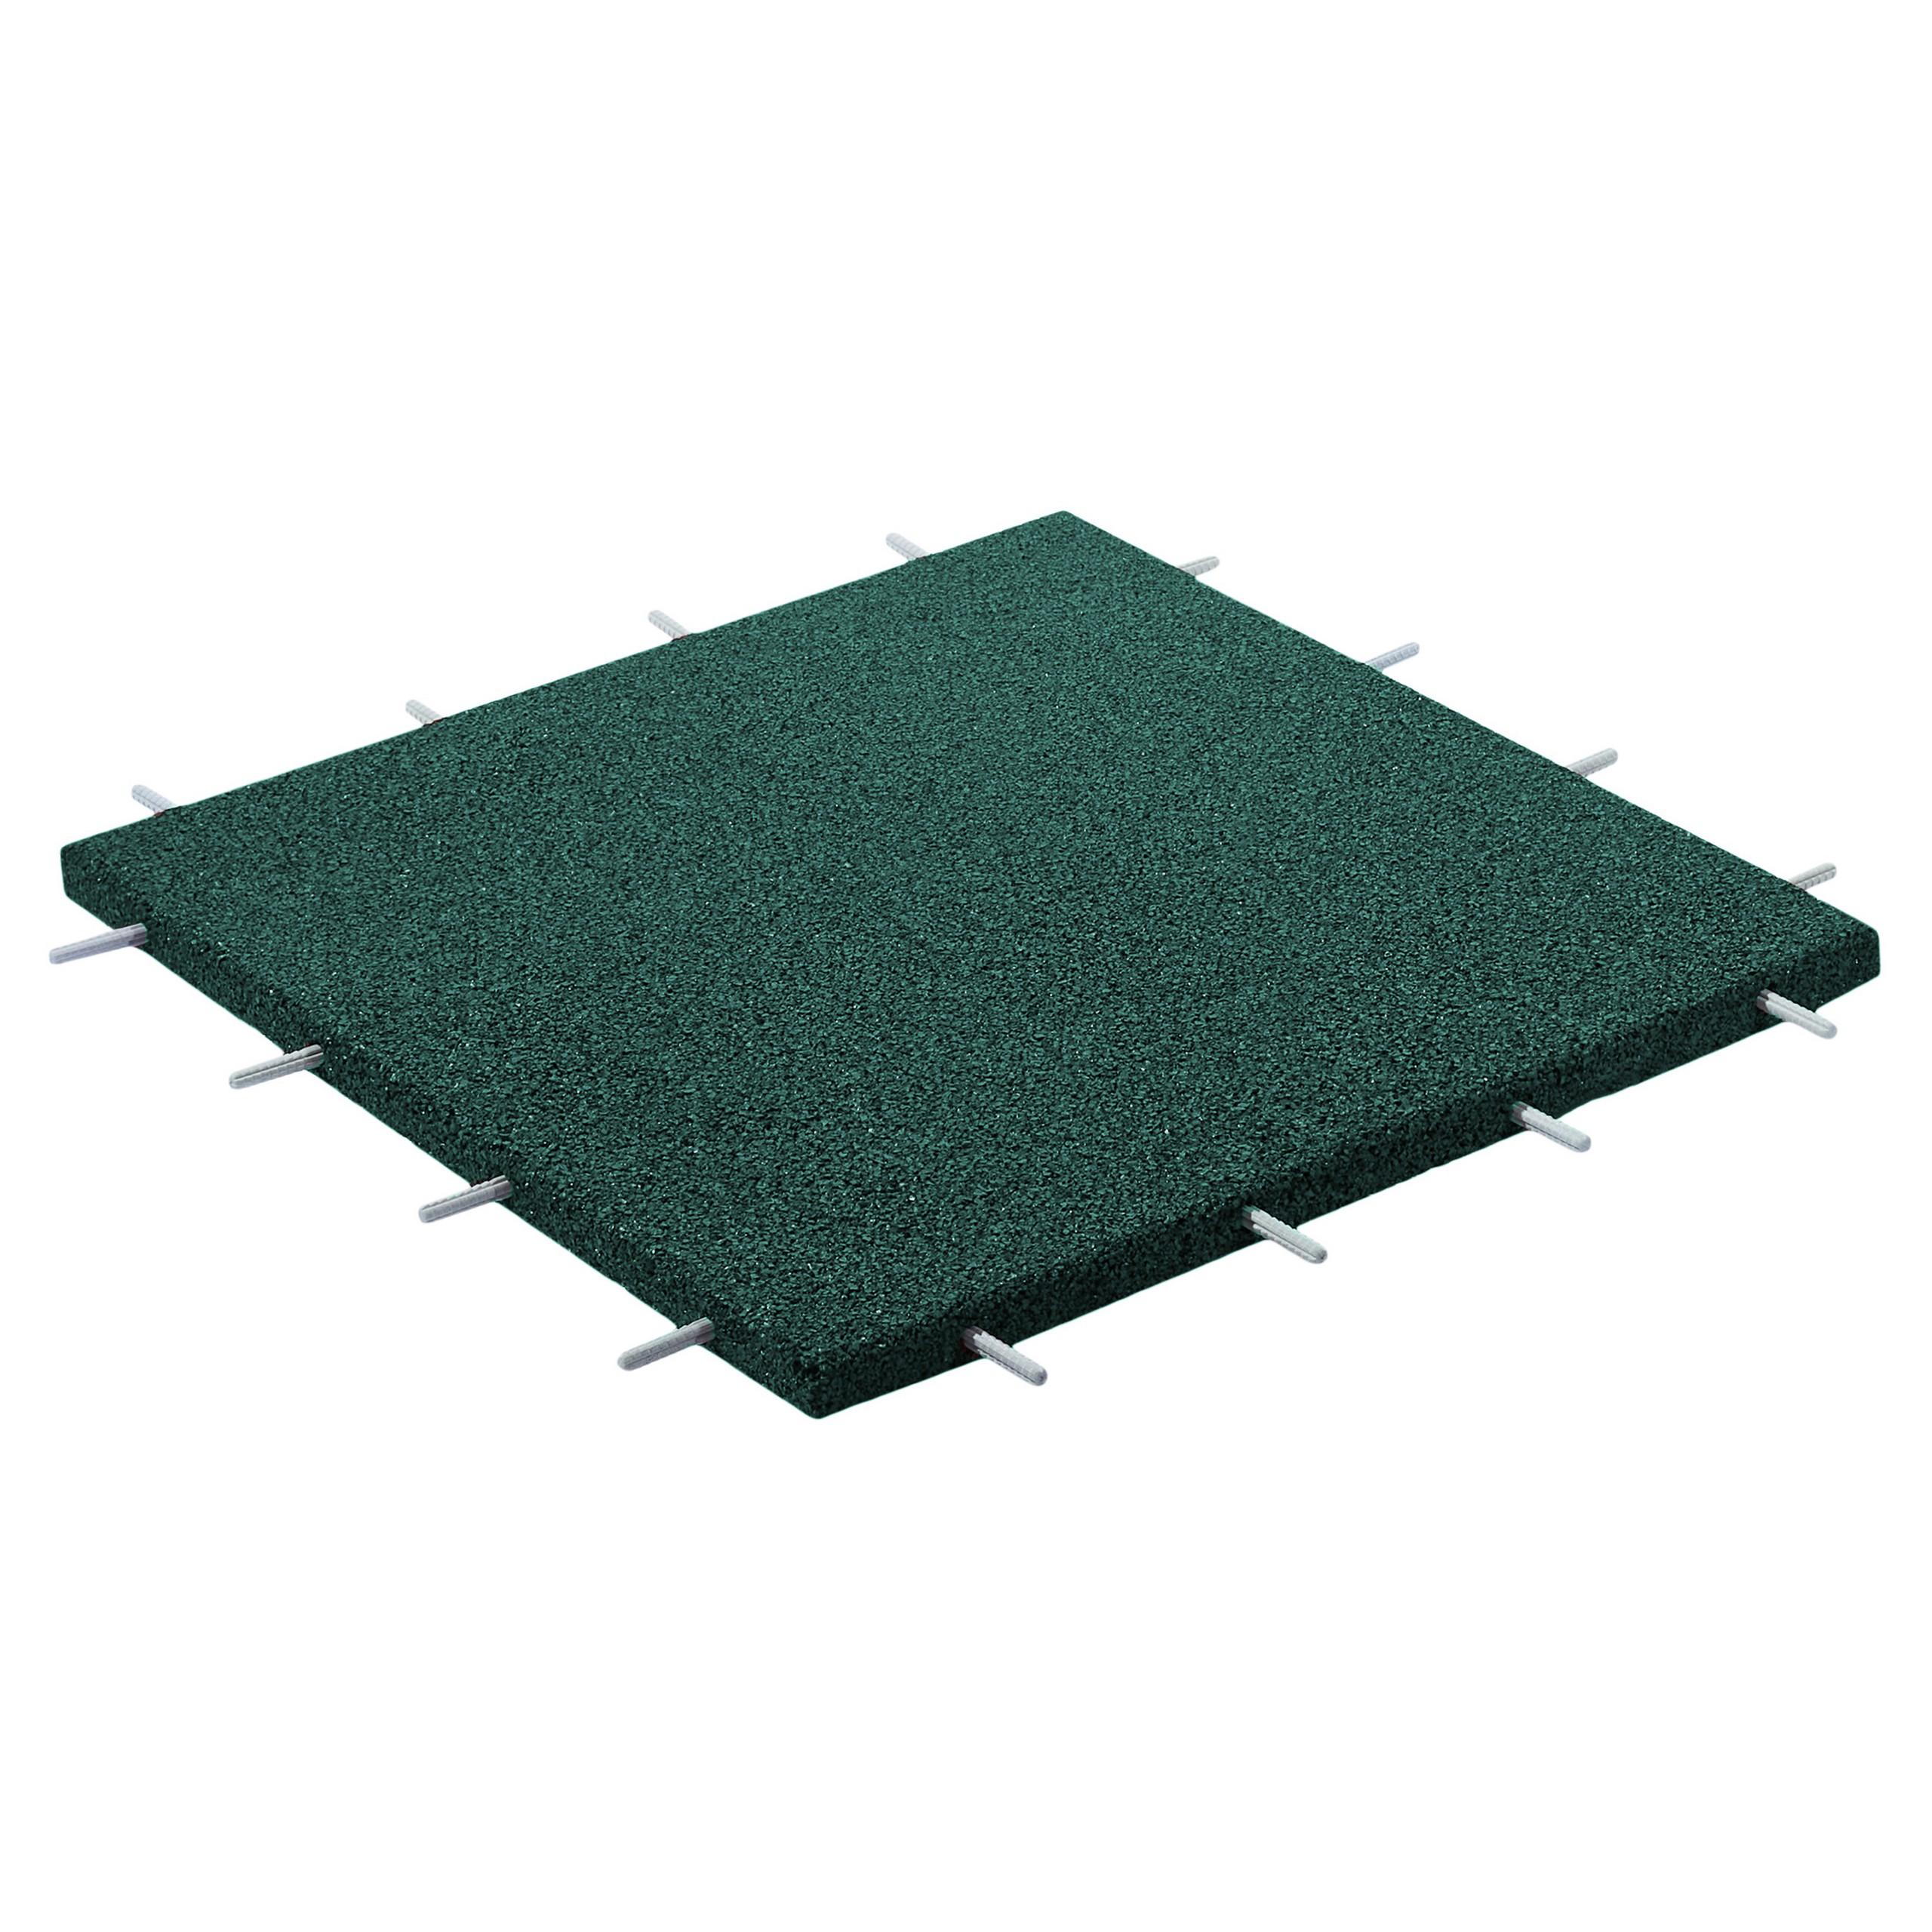 Terraflex Green